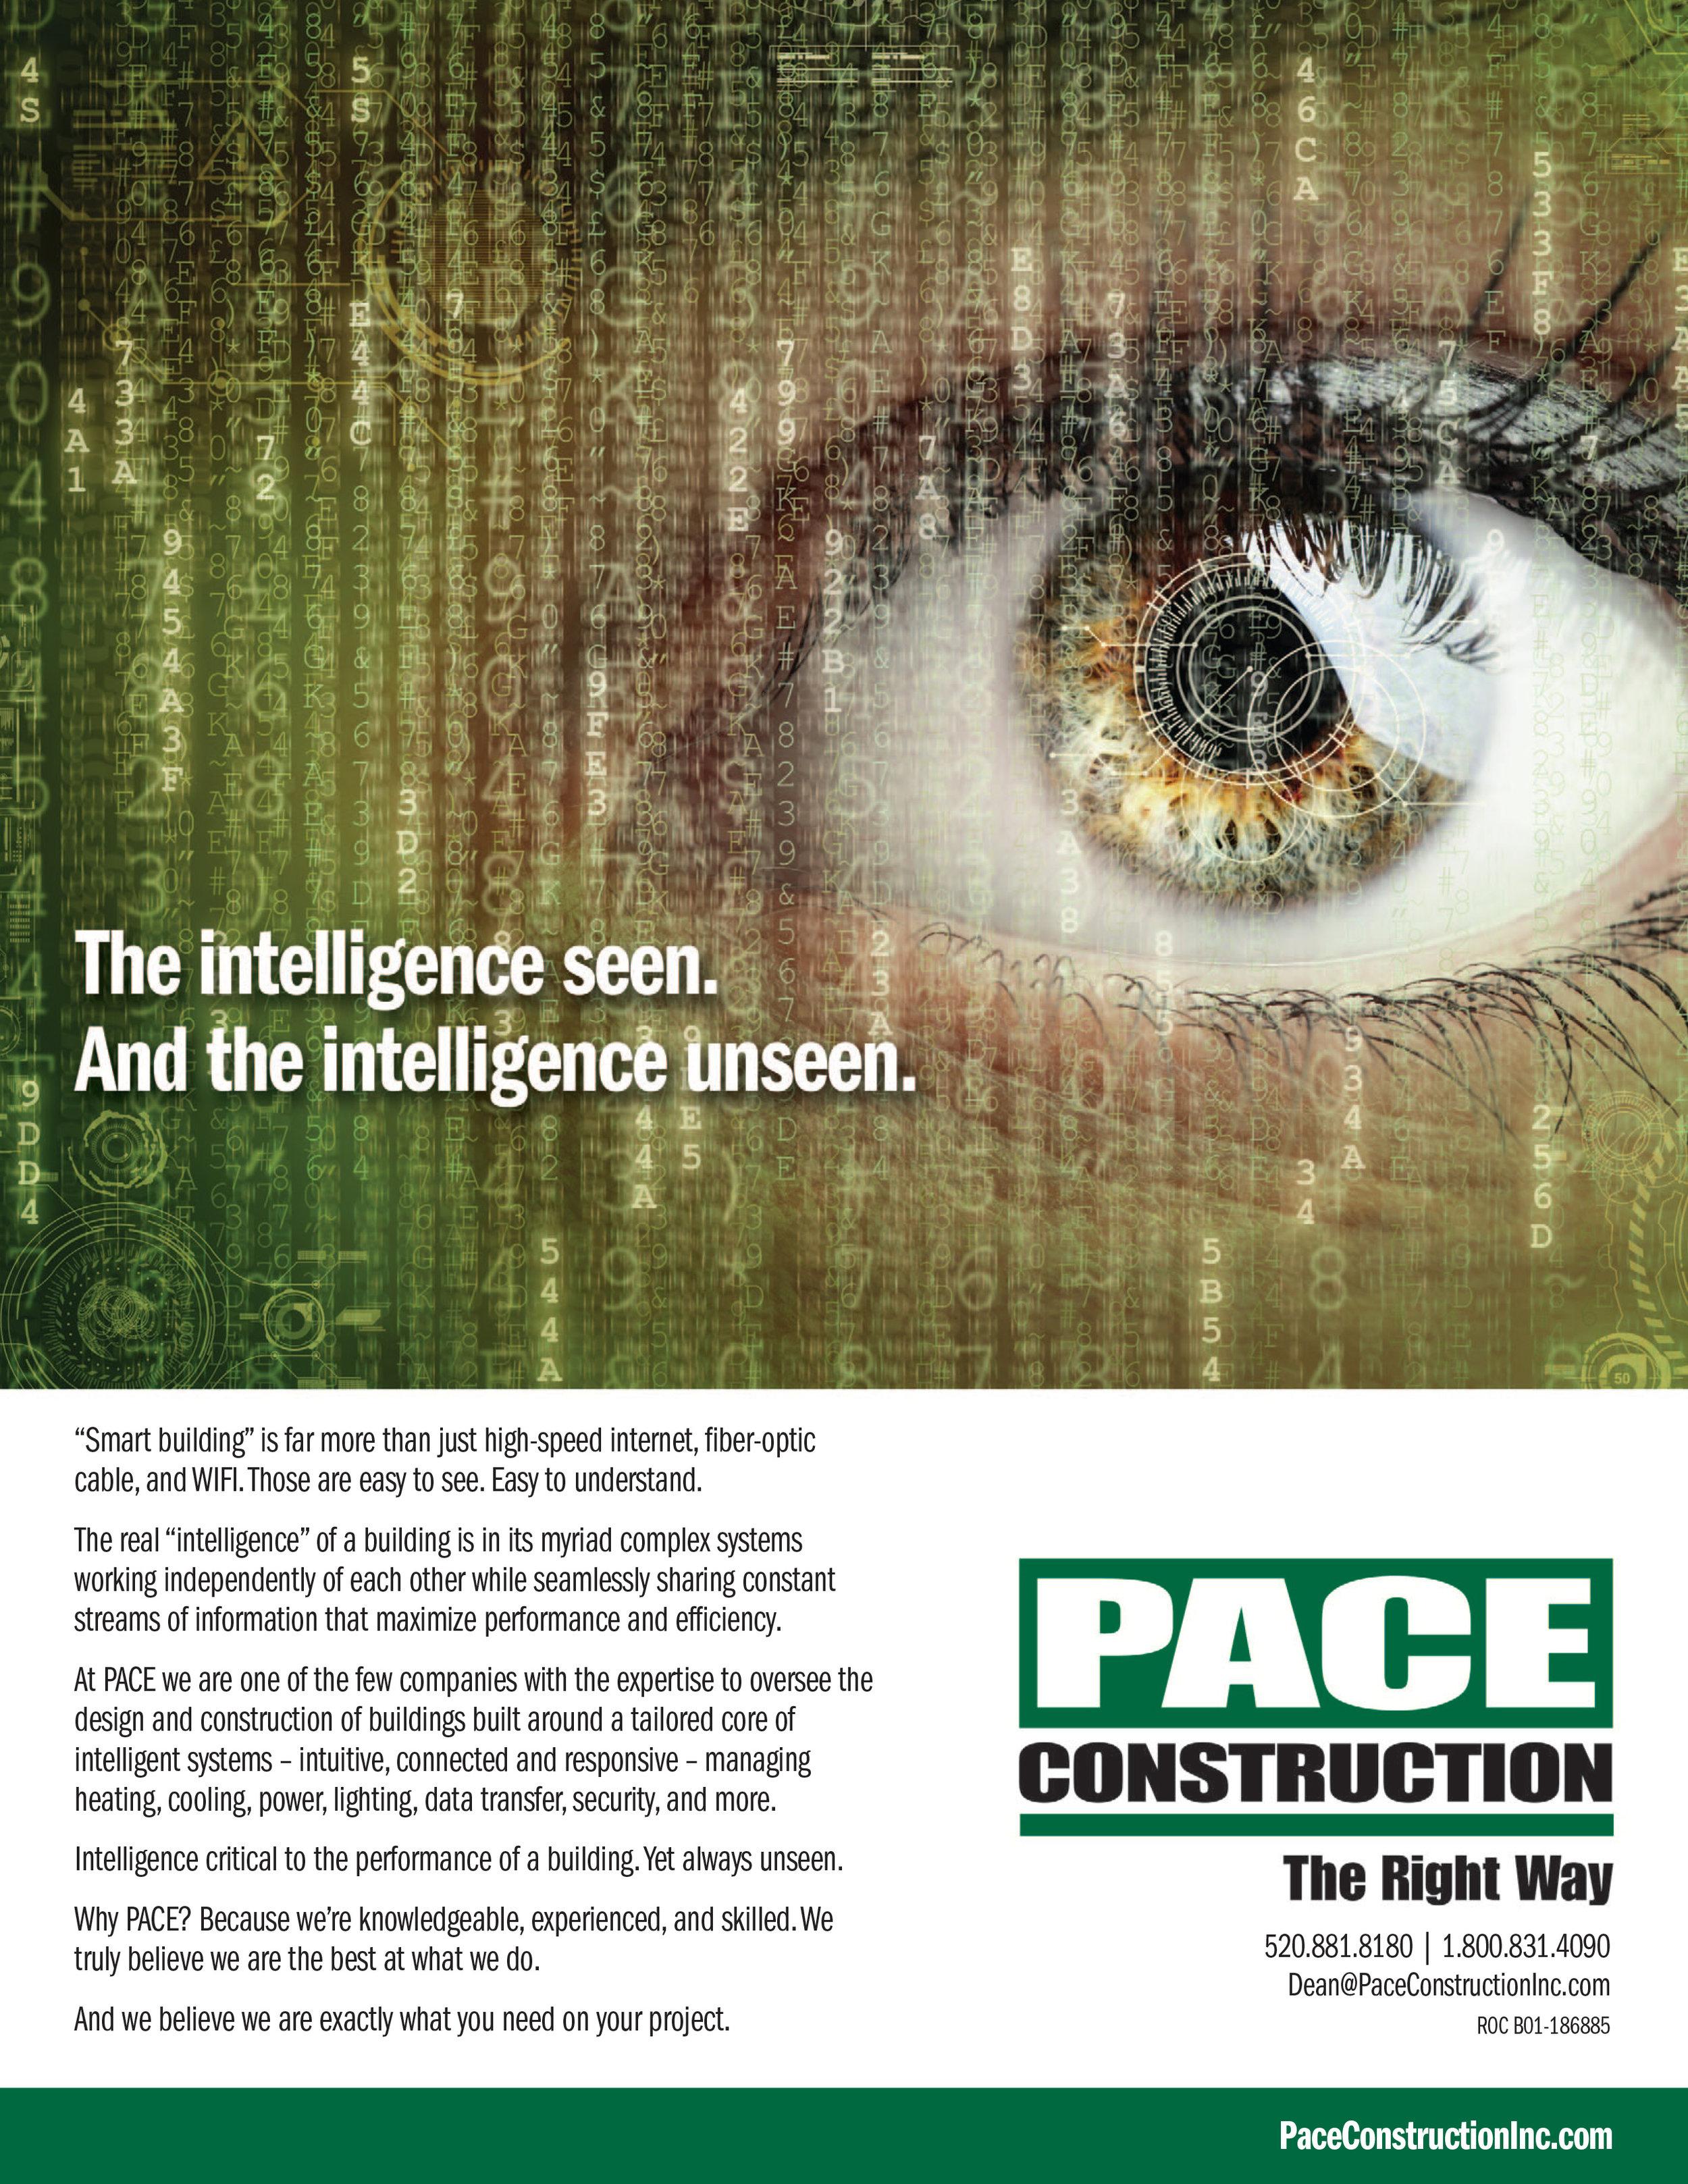 PACE-HumanEye Ad.jpg